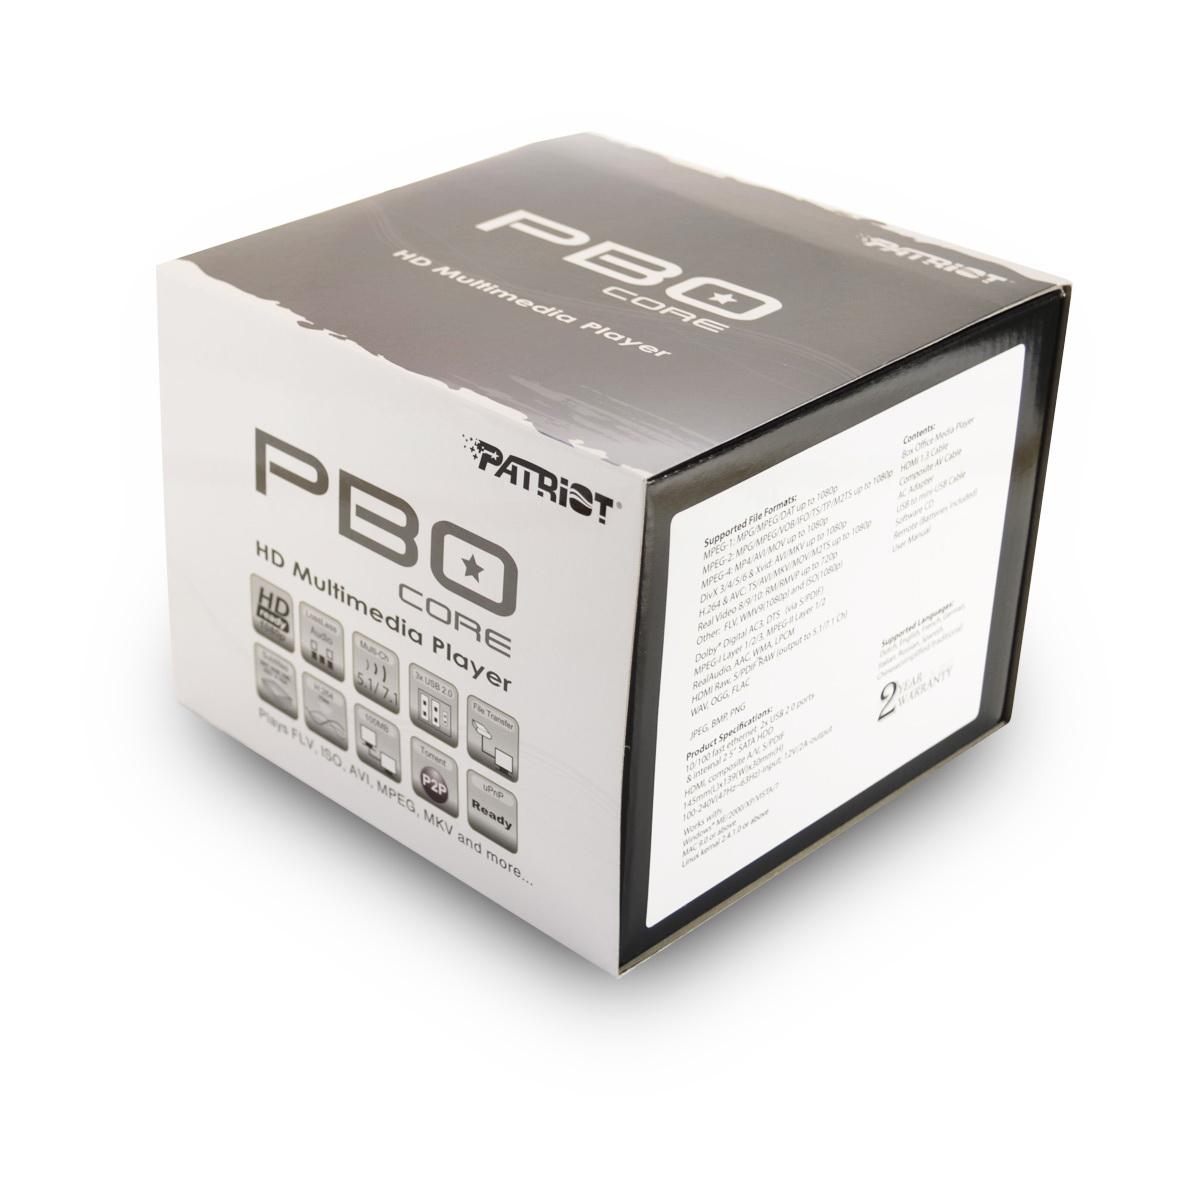 PATRIOT BOX OFFICE HD MEDIA PLAYER  52b4b6ee5b